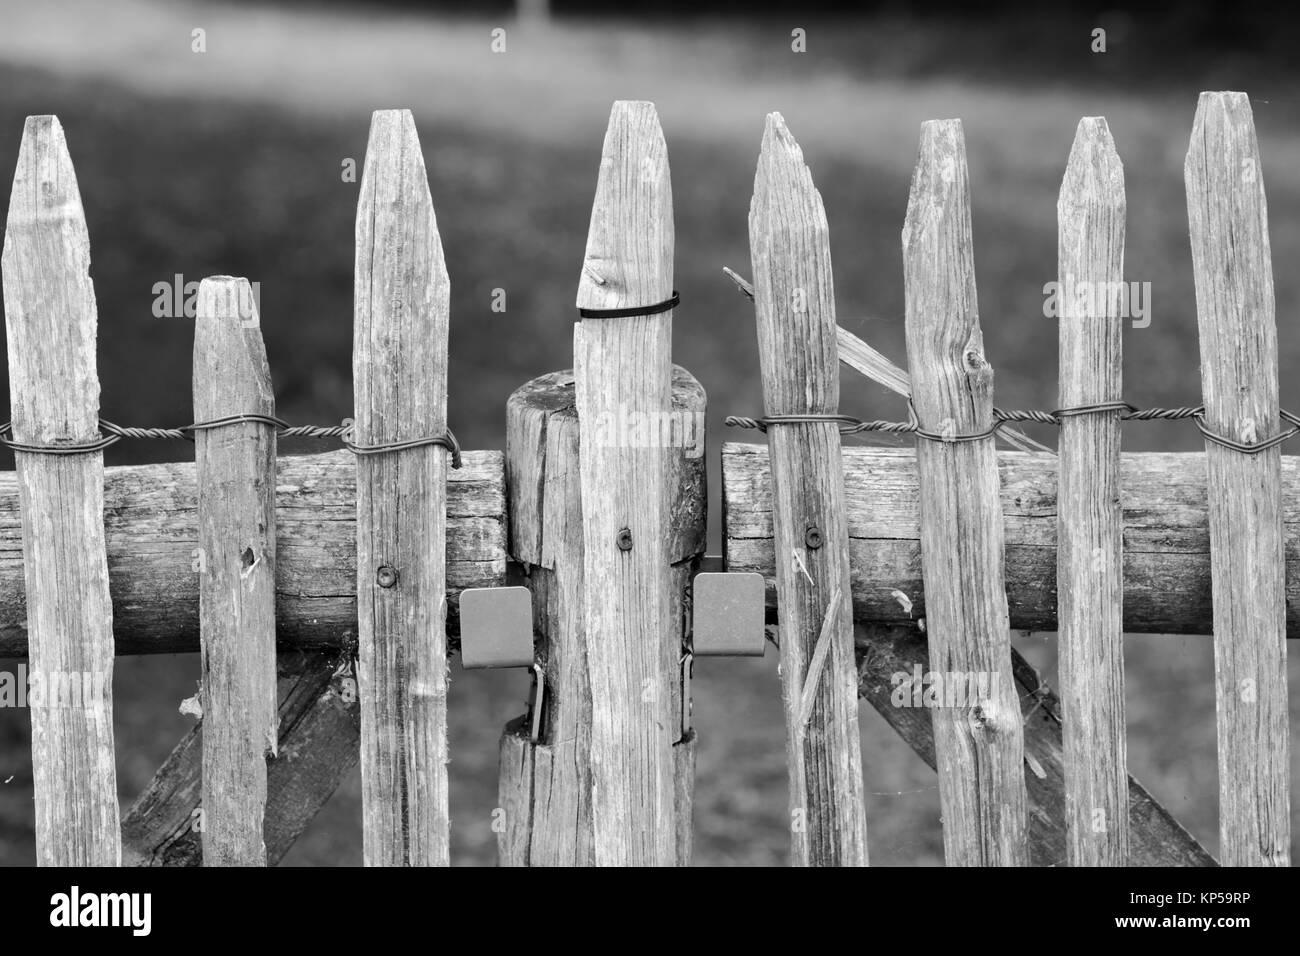 fence on frauenchiemsee,chiemgau,bayern,germany - Stock Image